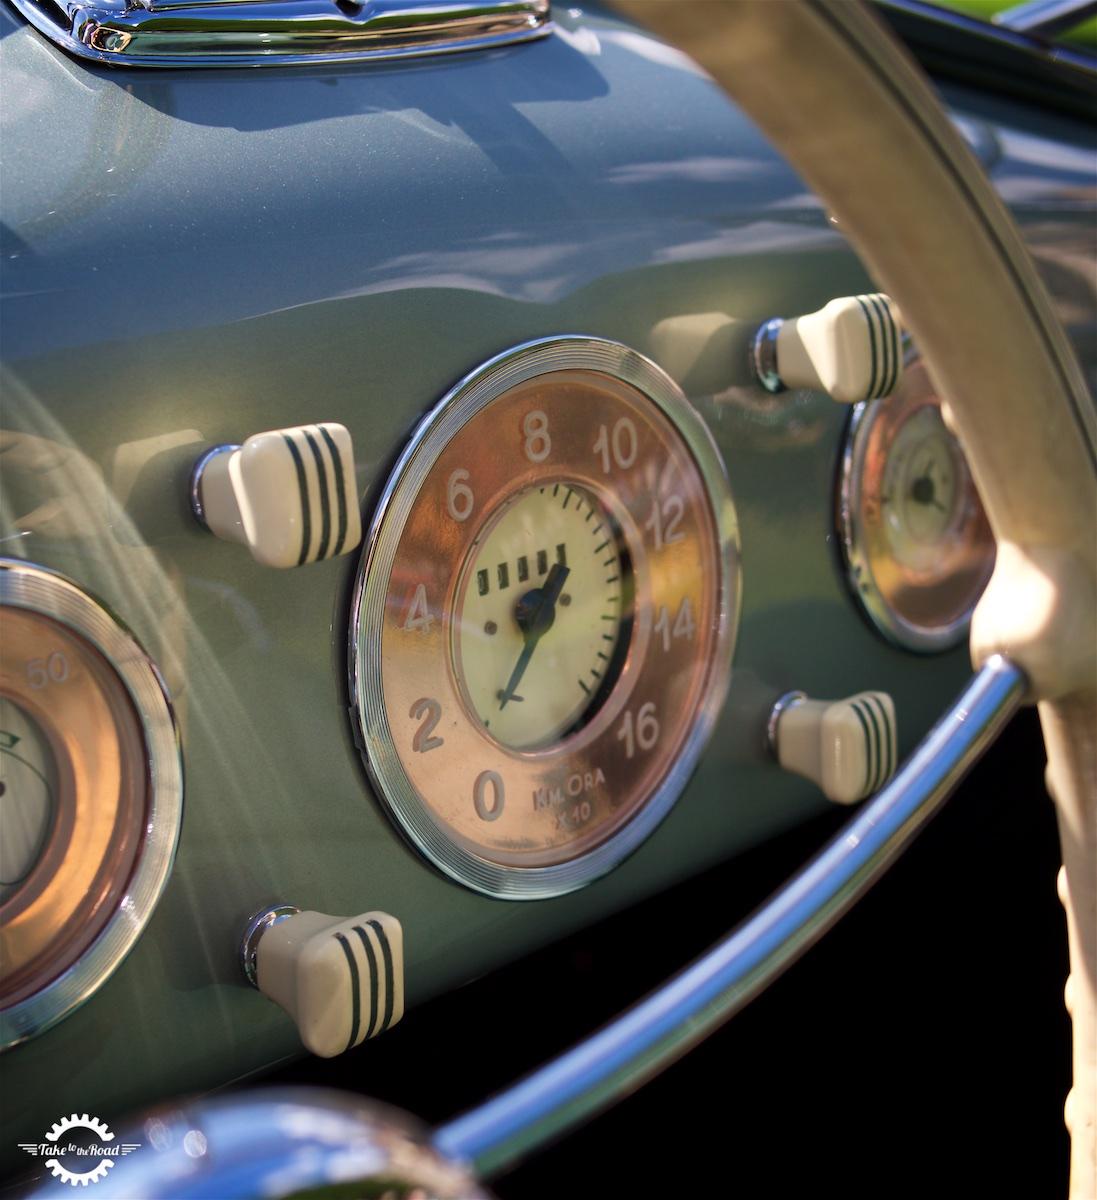 Stunning one off 1946 Fiat 1100C Spider headed to Bonhams